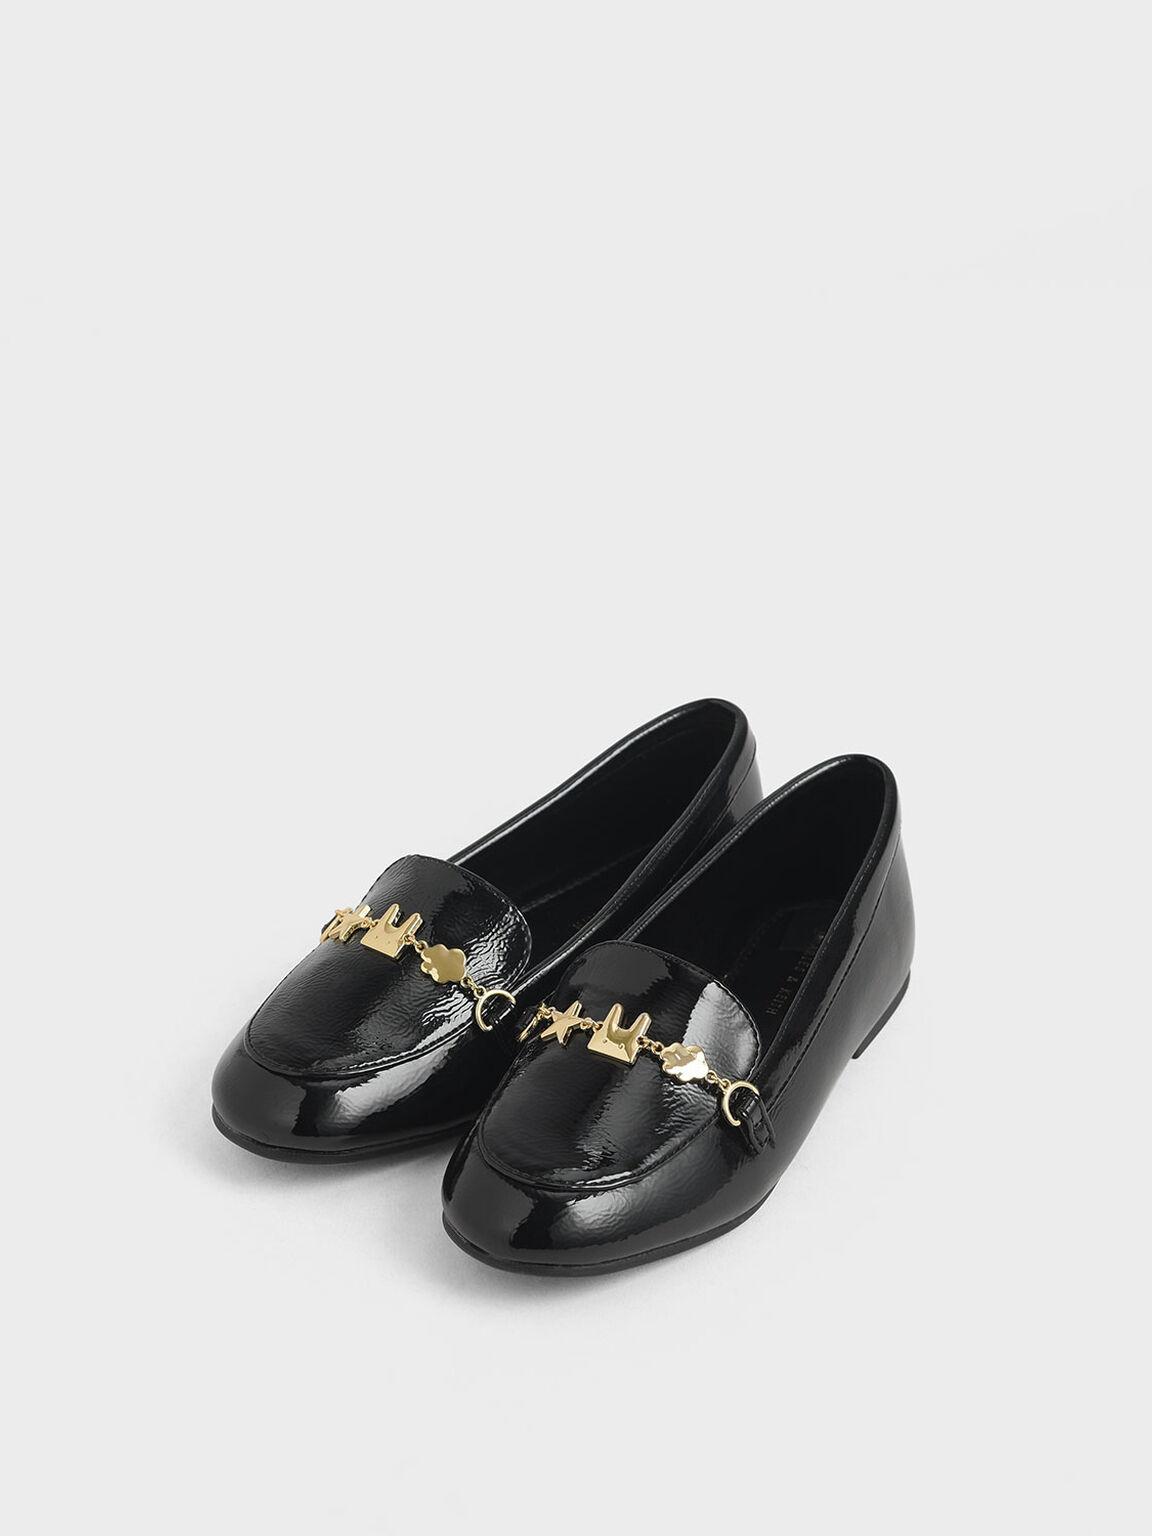 Girls' Wrinkled Patent Charm Loafers, Black, hi-res